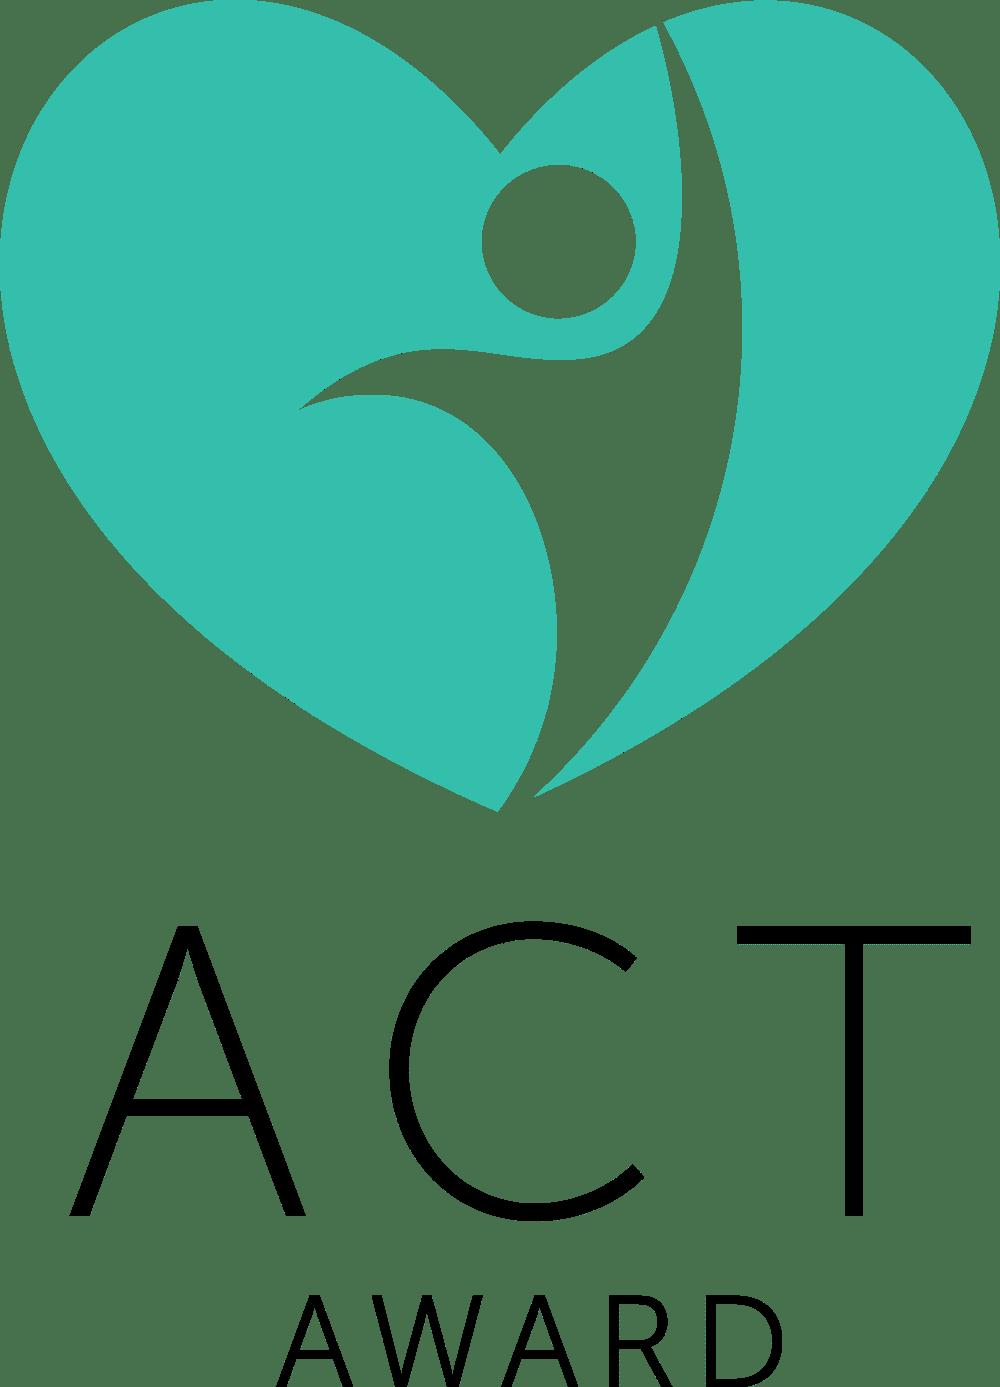 ACW ACT Award